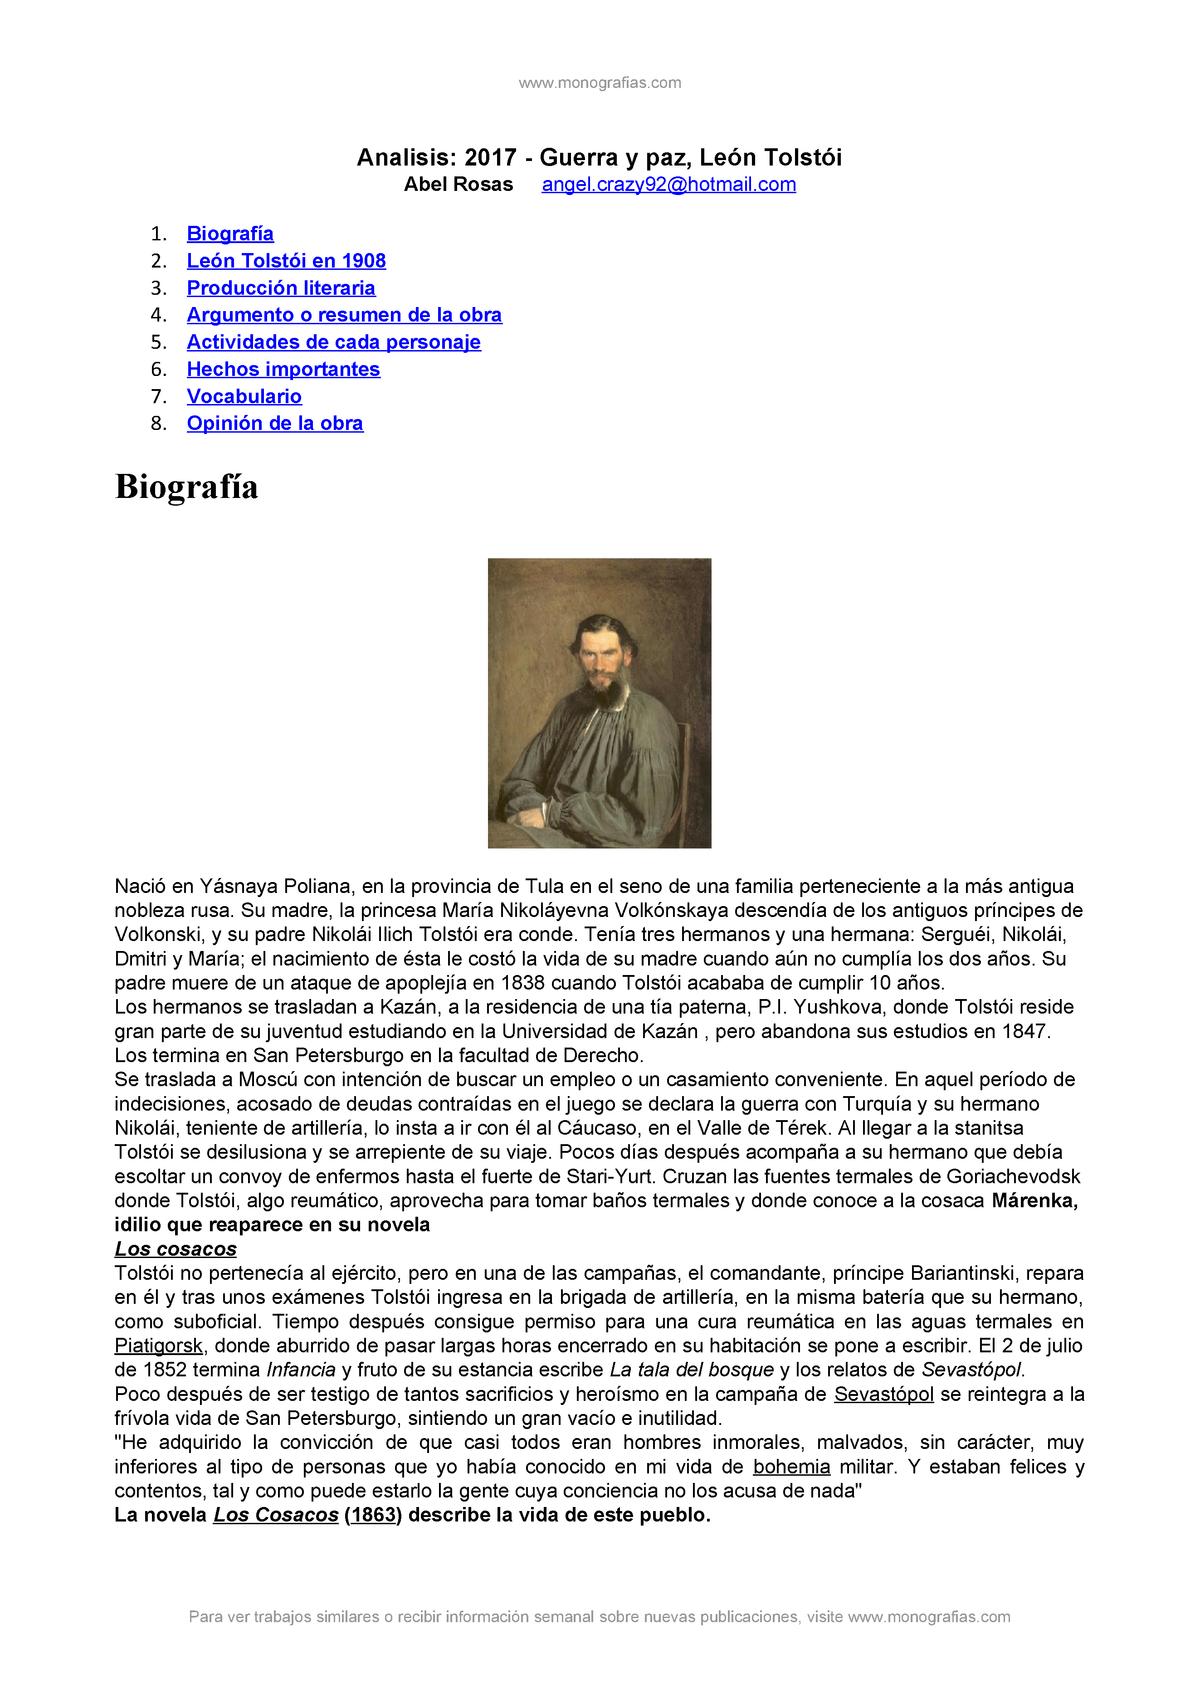 341602030 Analisis Guerra Y Paz Leon Tolstoi Analisis 2017 Guerra Paz Le Tolst Studocu